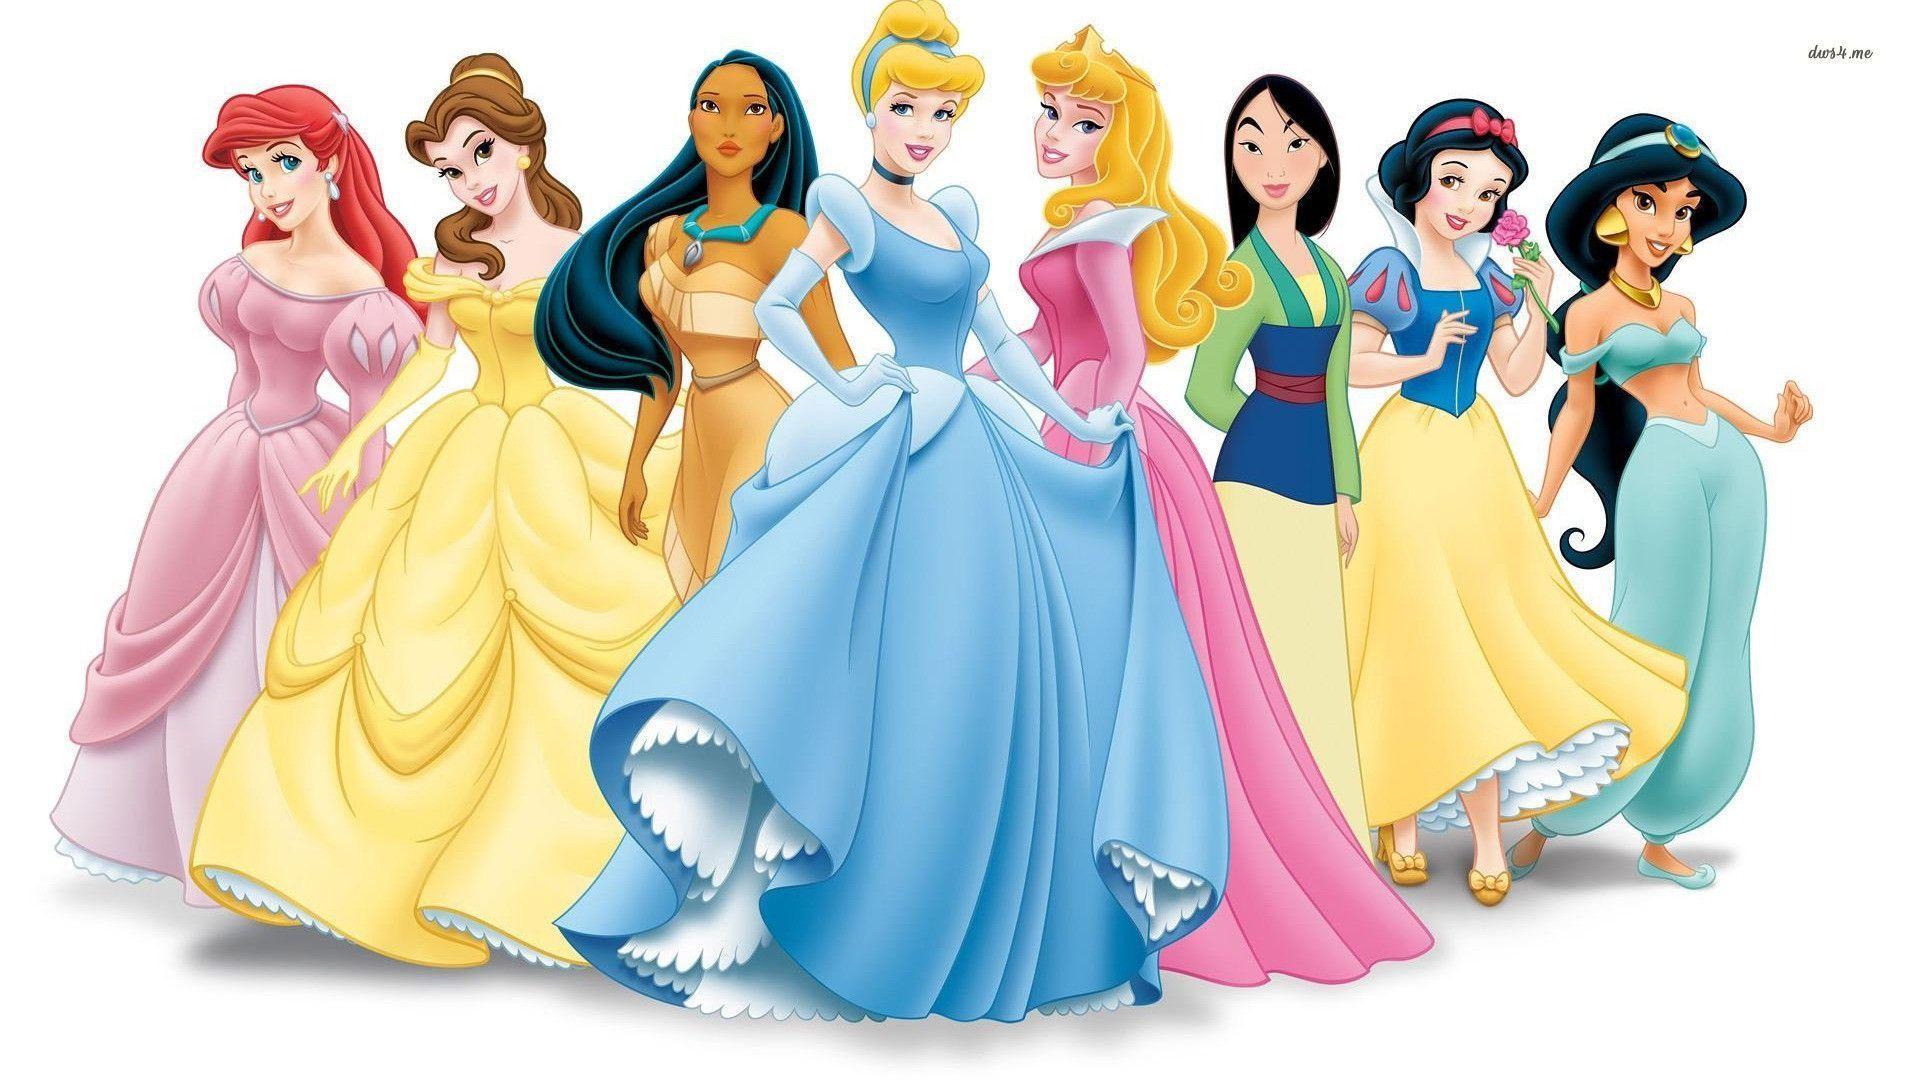 Disney Princess Backgrounds - Wallpaper Cave